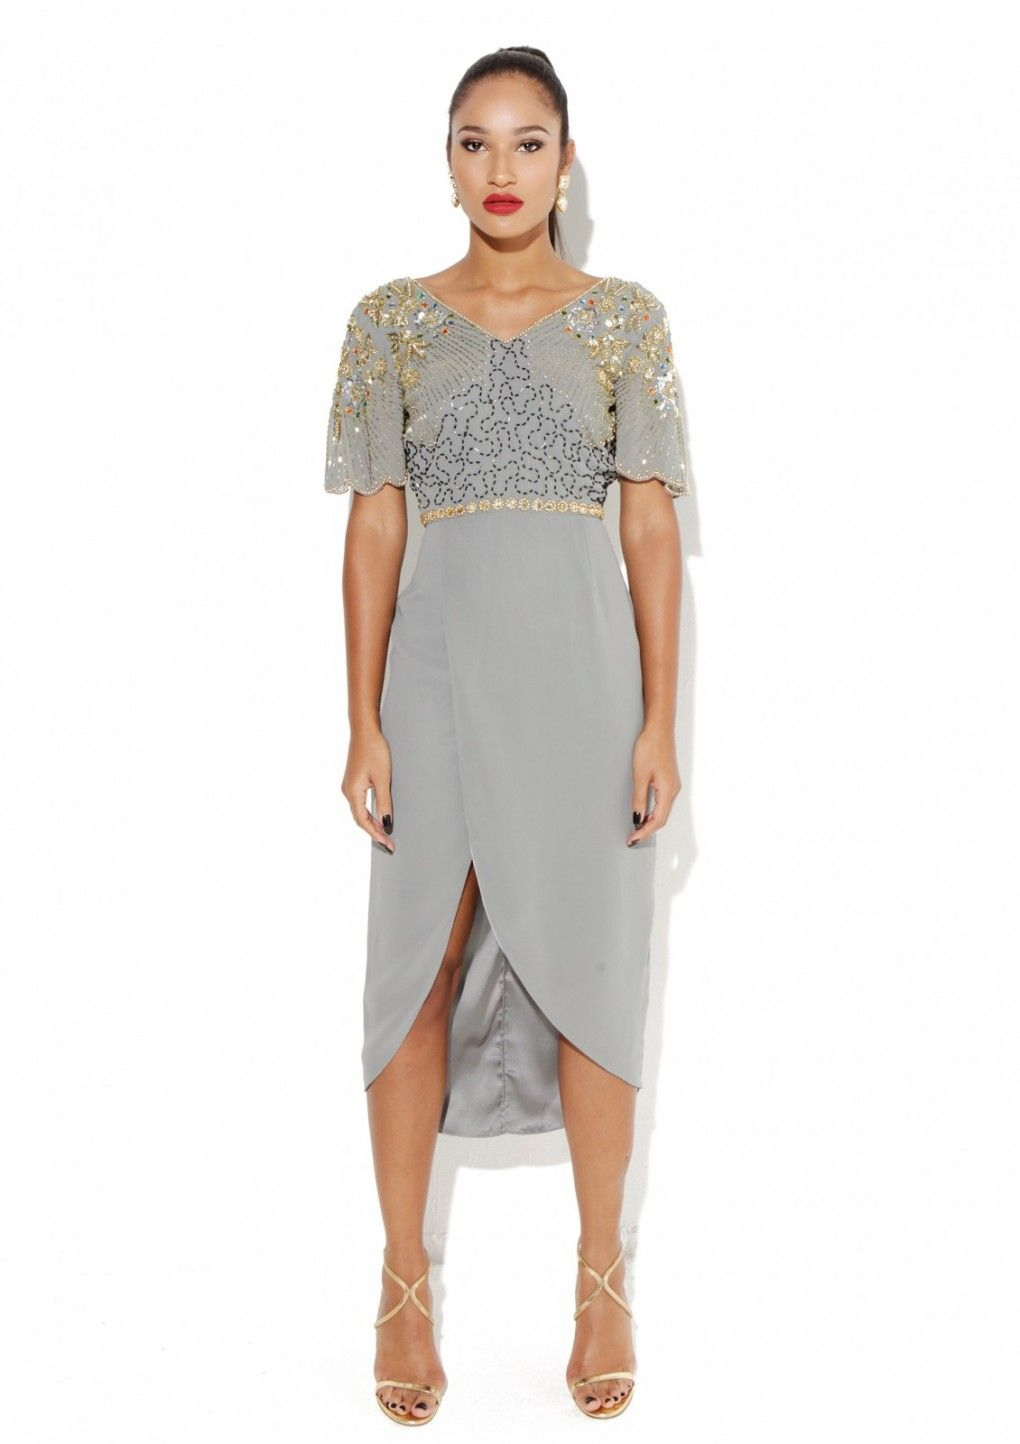 84f3bffda4 Reena Grey Dress - Virgos Lounge